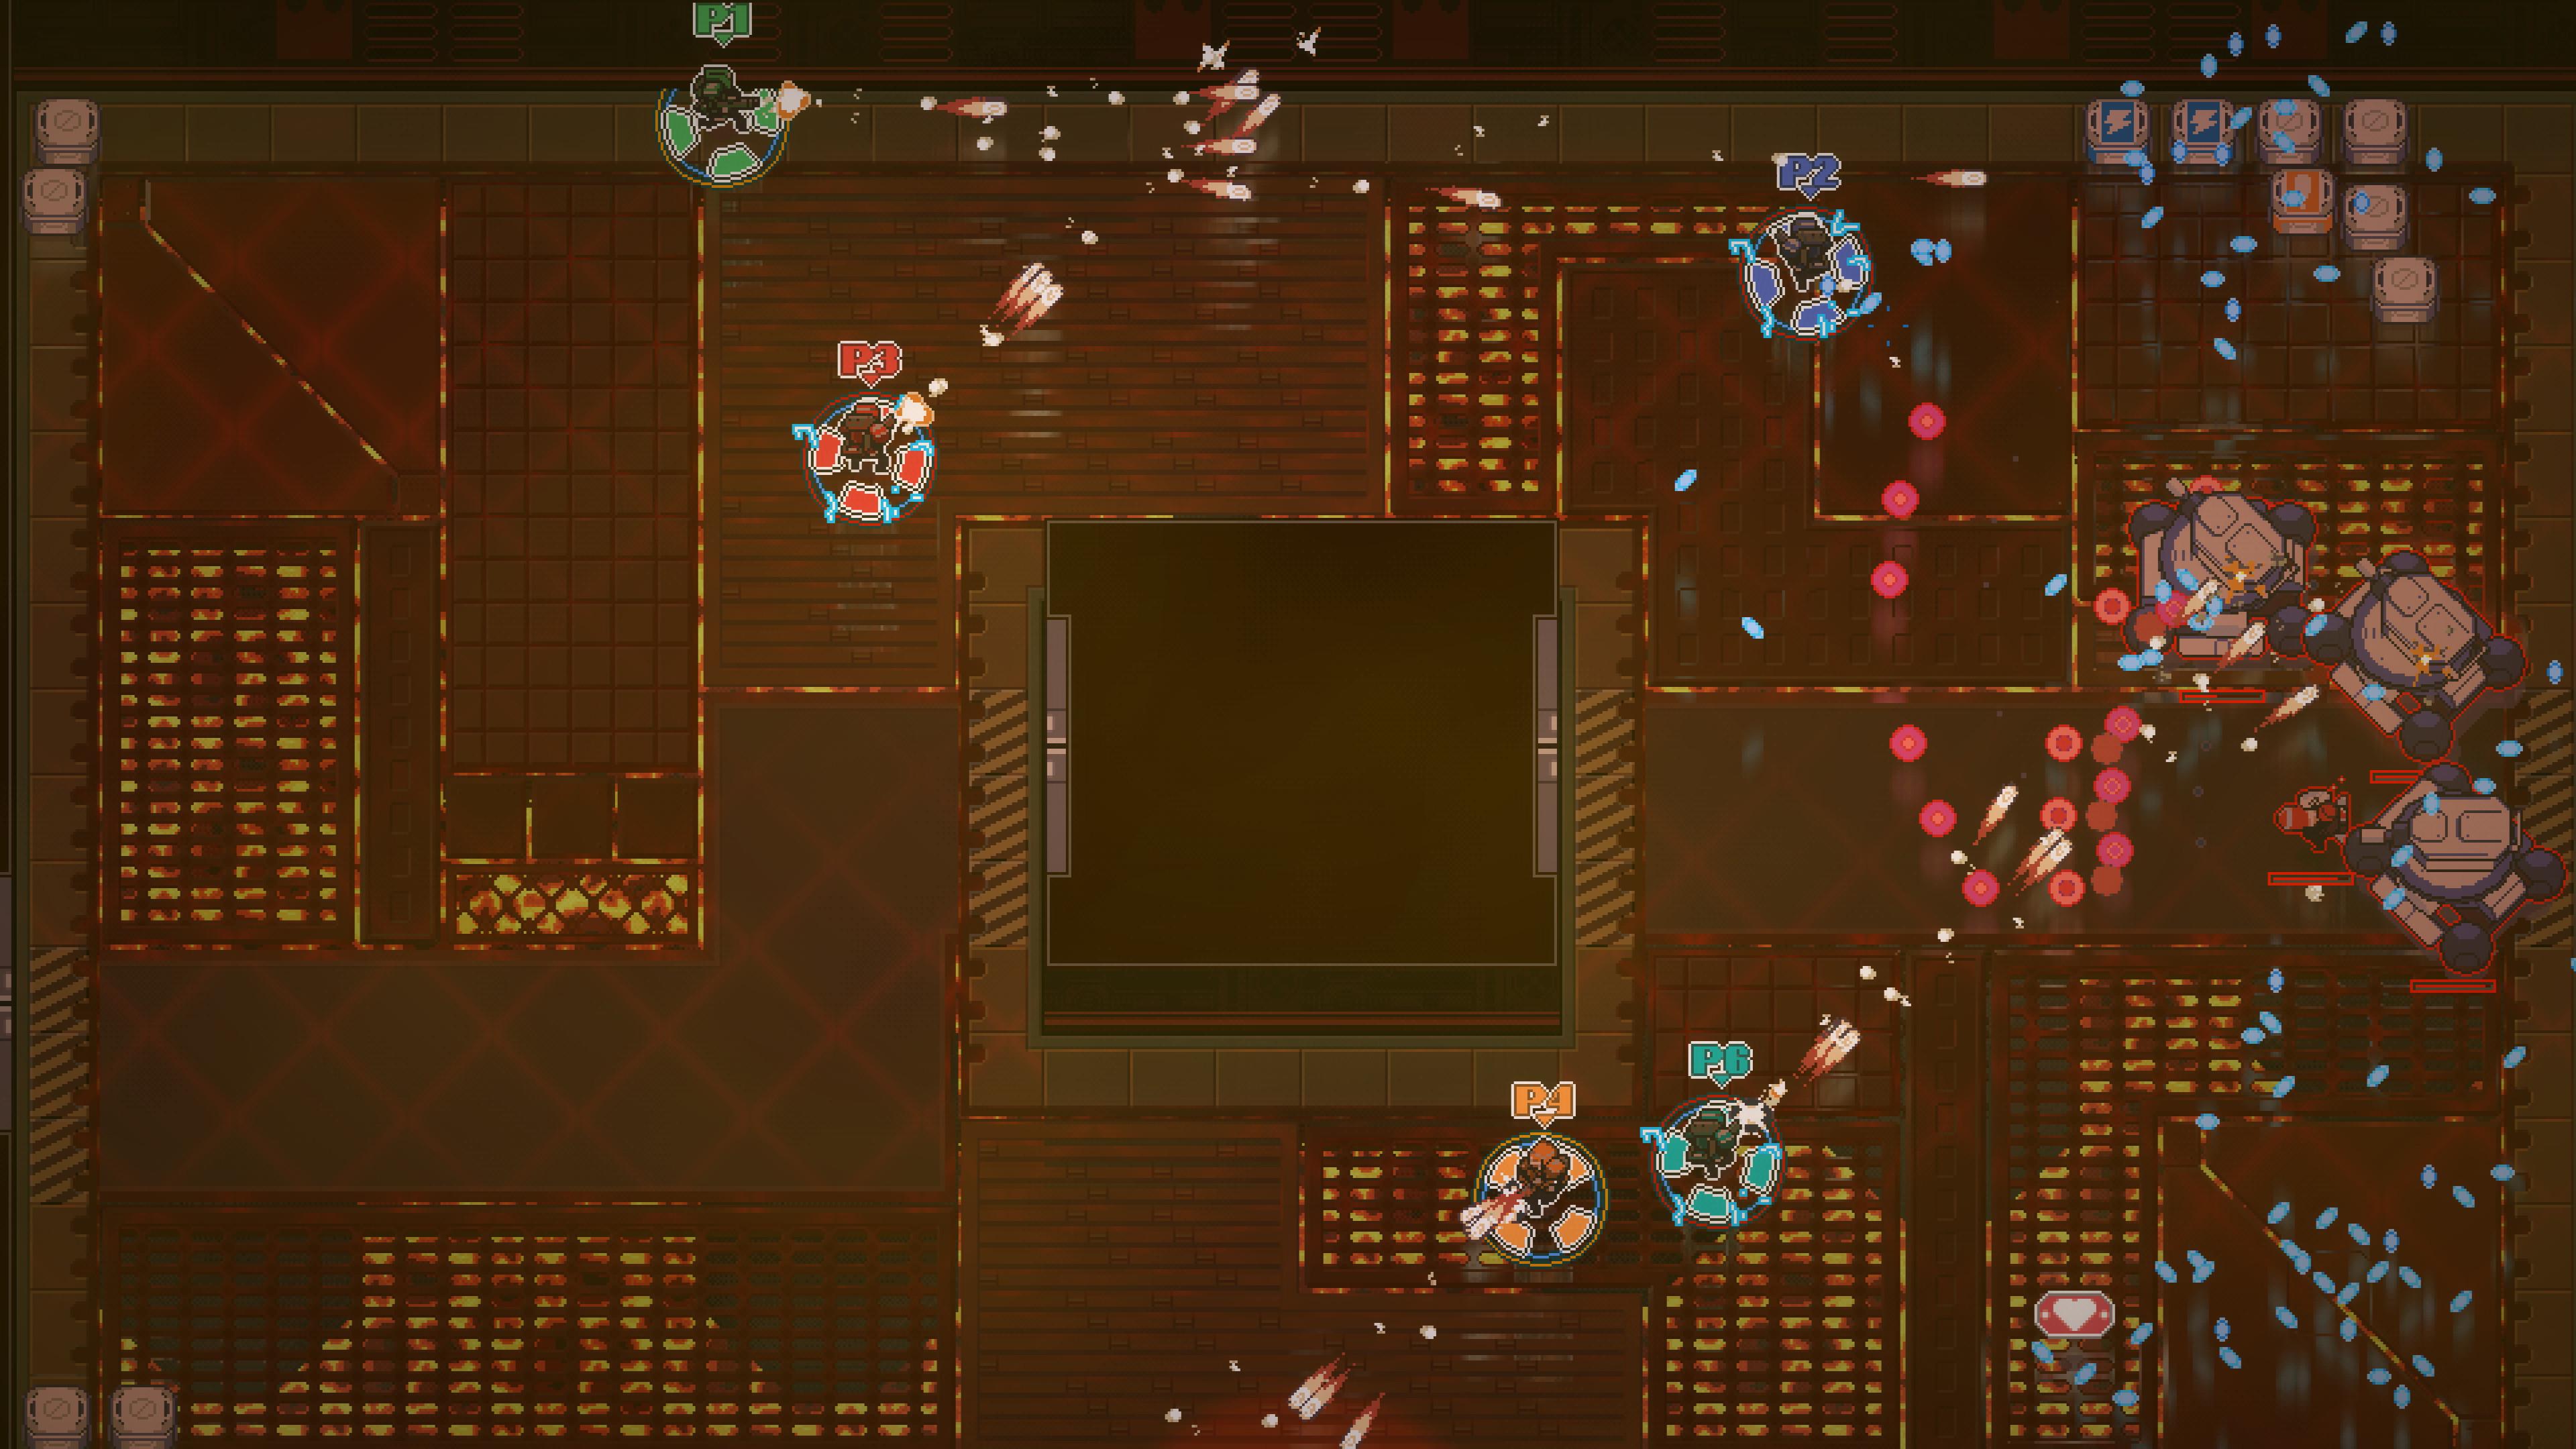 SUPER CIRCUIT BREAKERS - GADD screenshot